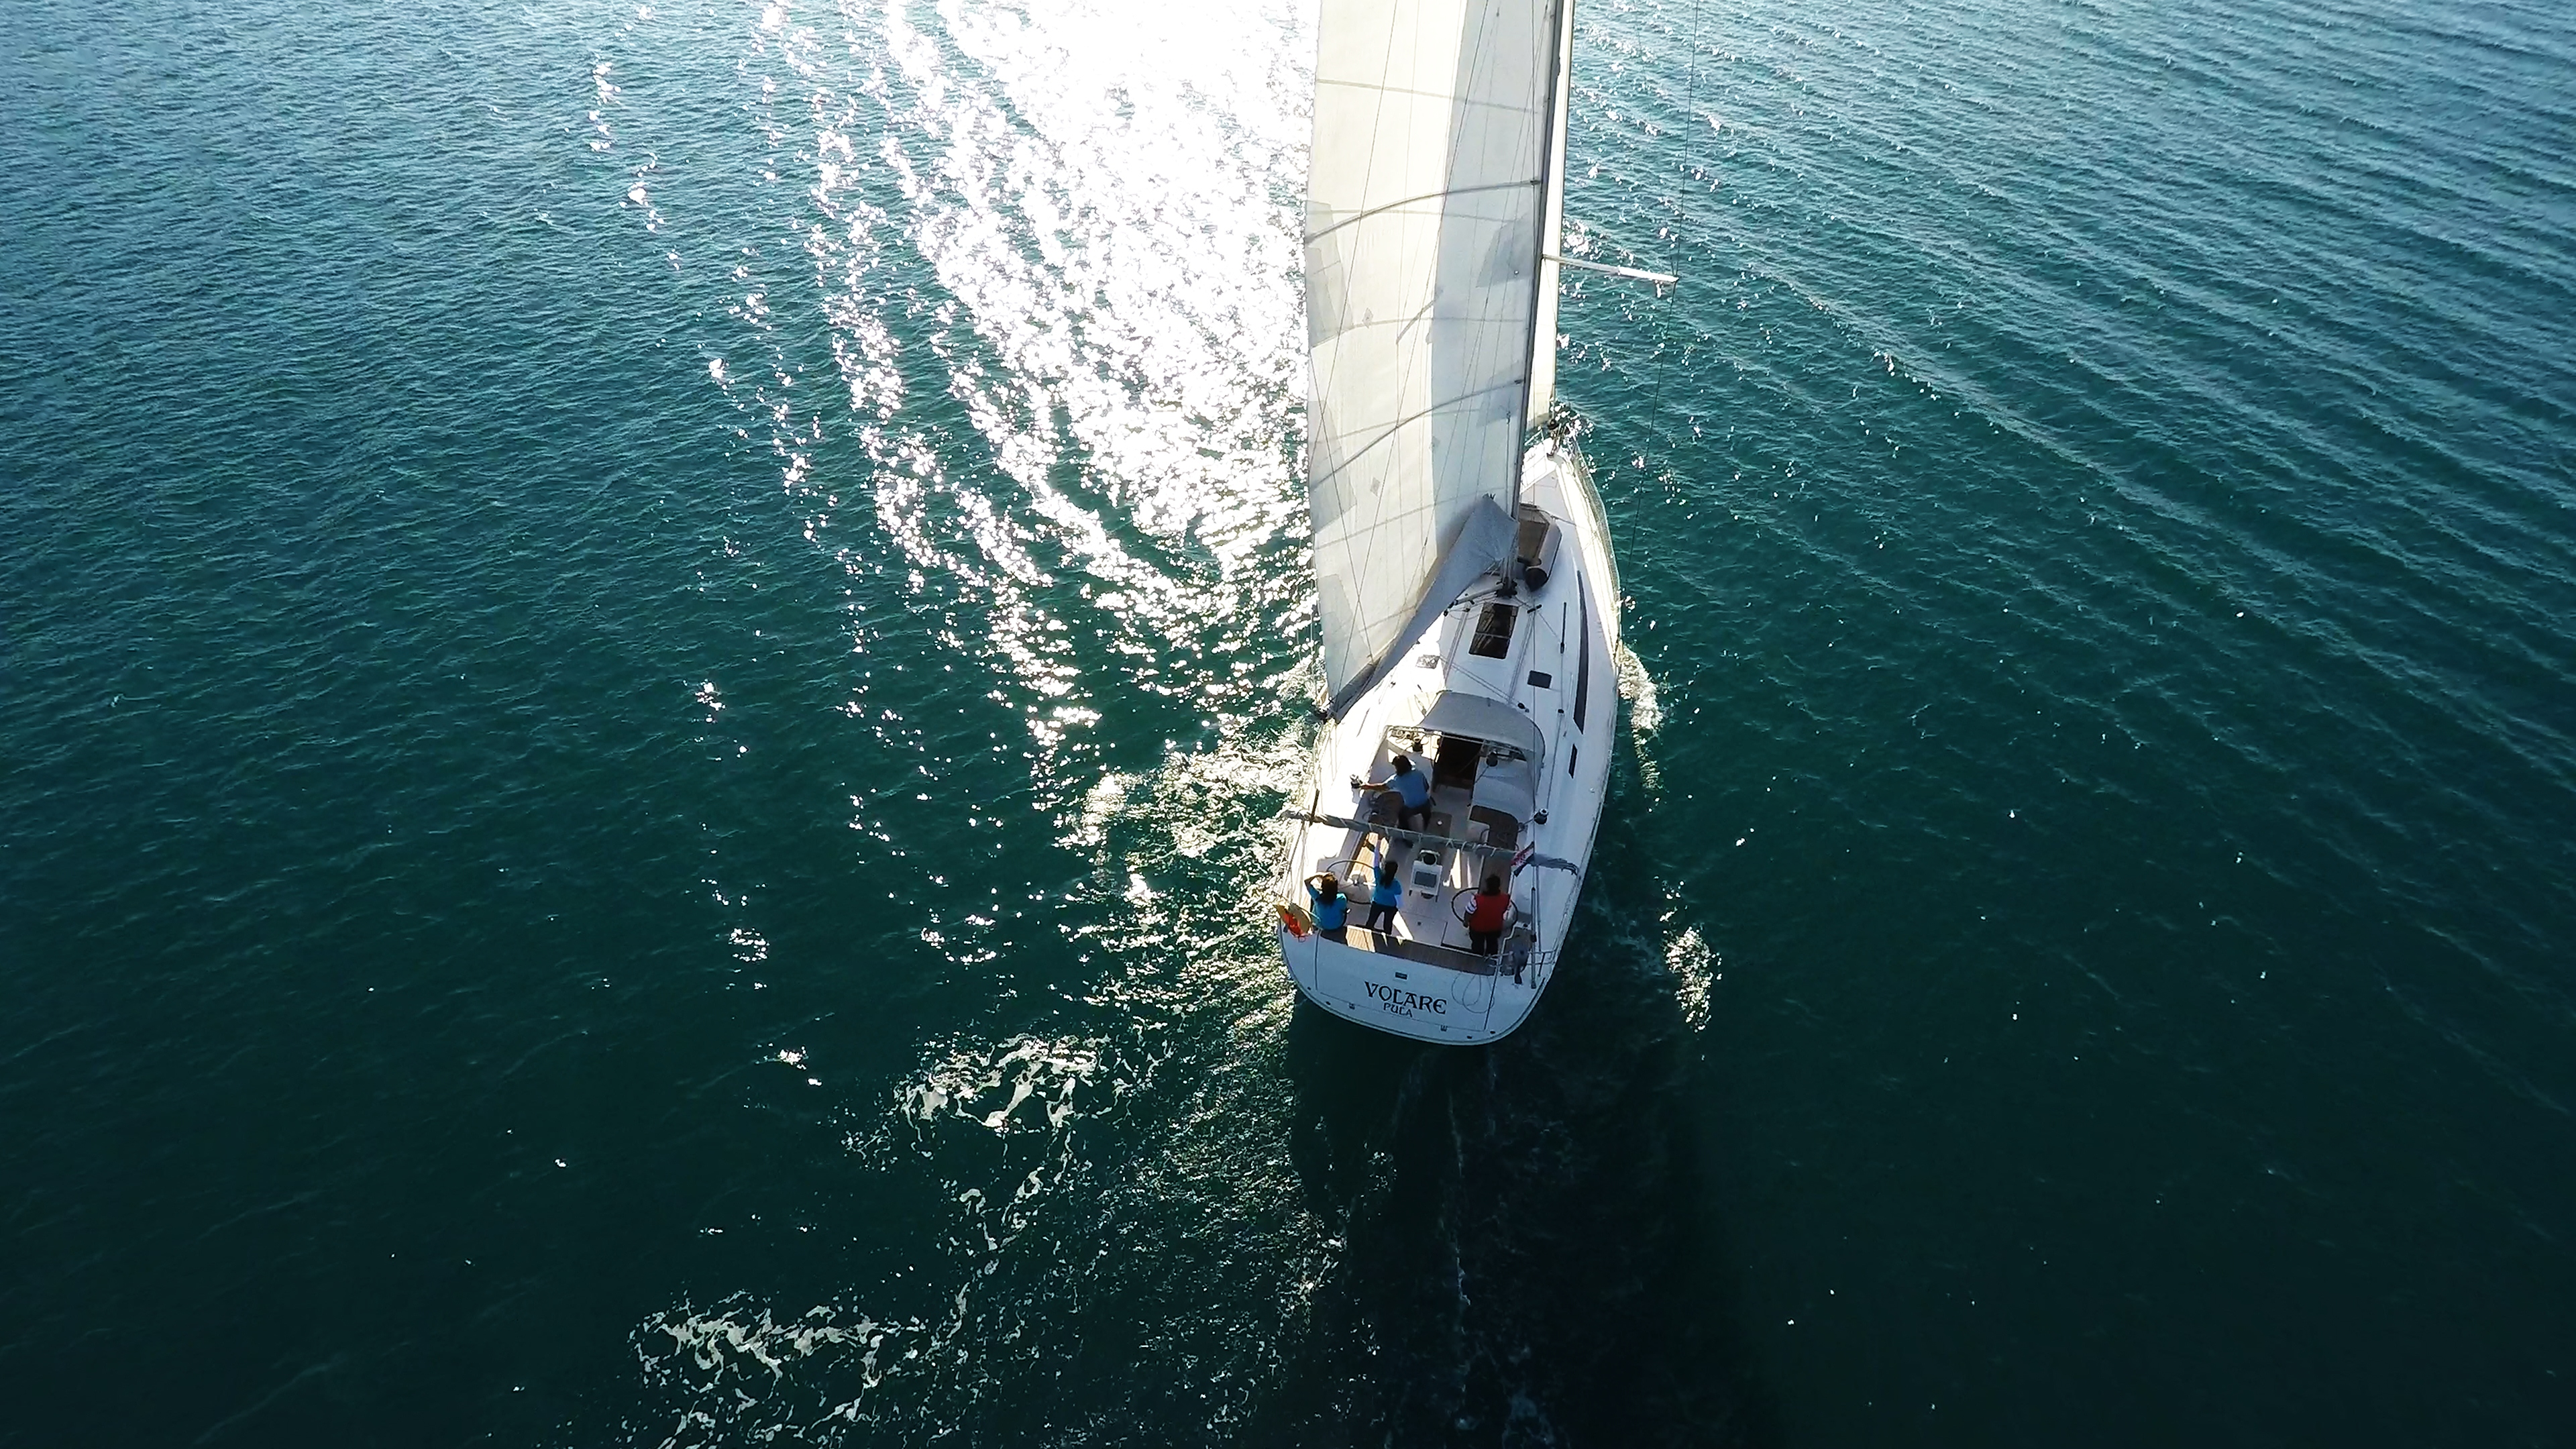 barcha a vela yacht a vela bavaria 46 da sopra vista di uccello